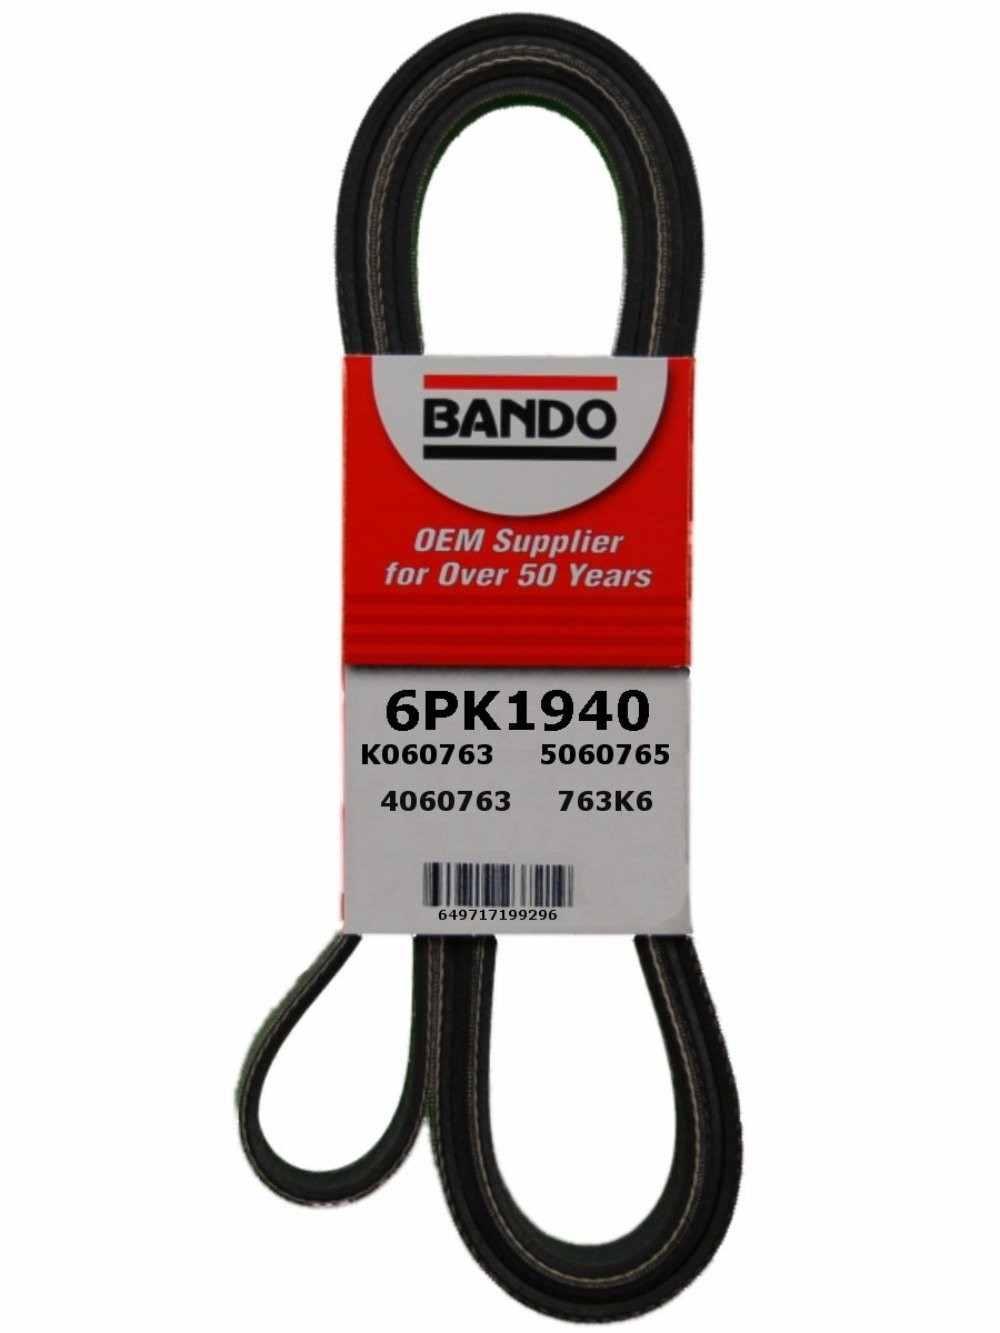 BANDO - Serpentine Belt (Water Pump, Alternator, Air Conditioning and Power Steering) - BWO 6PK1940